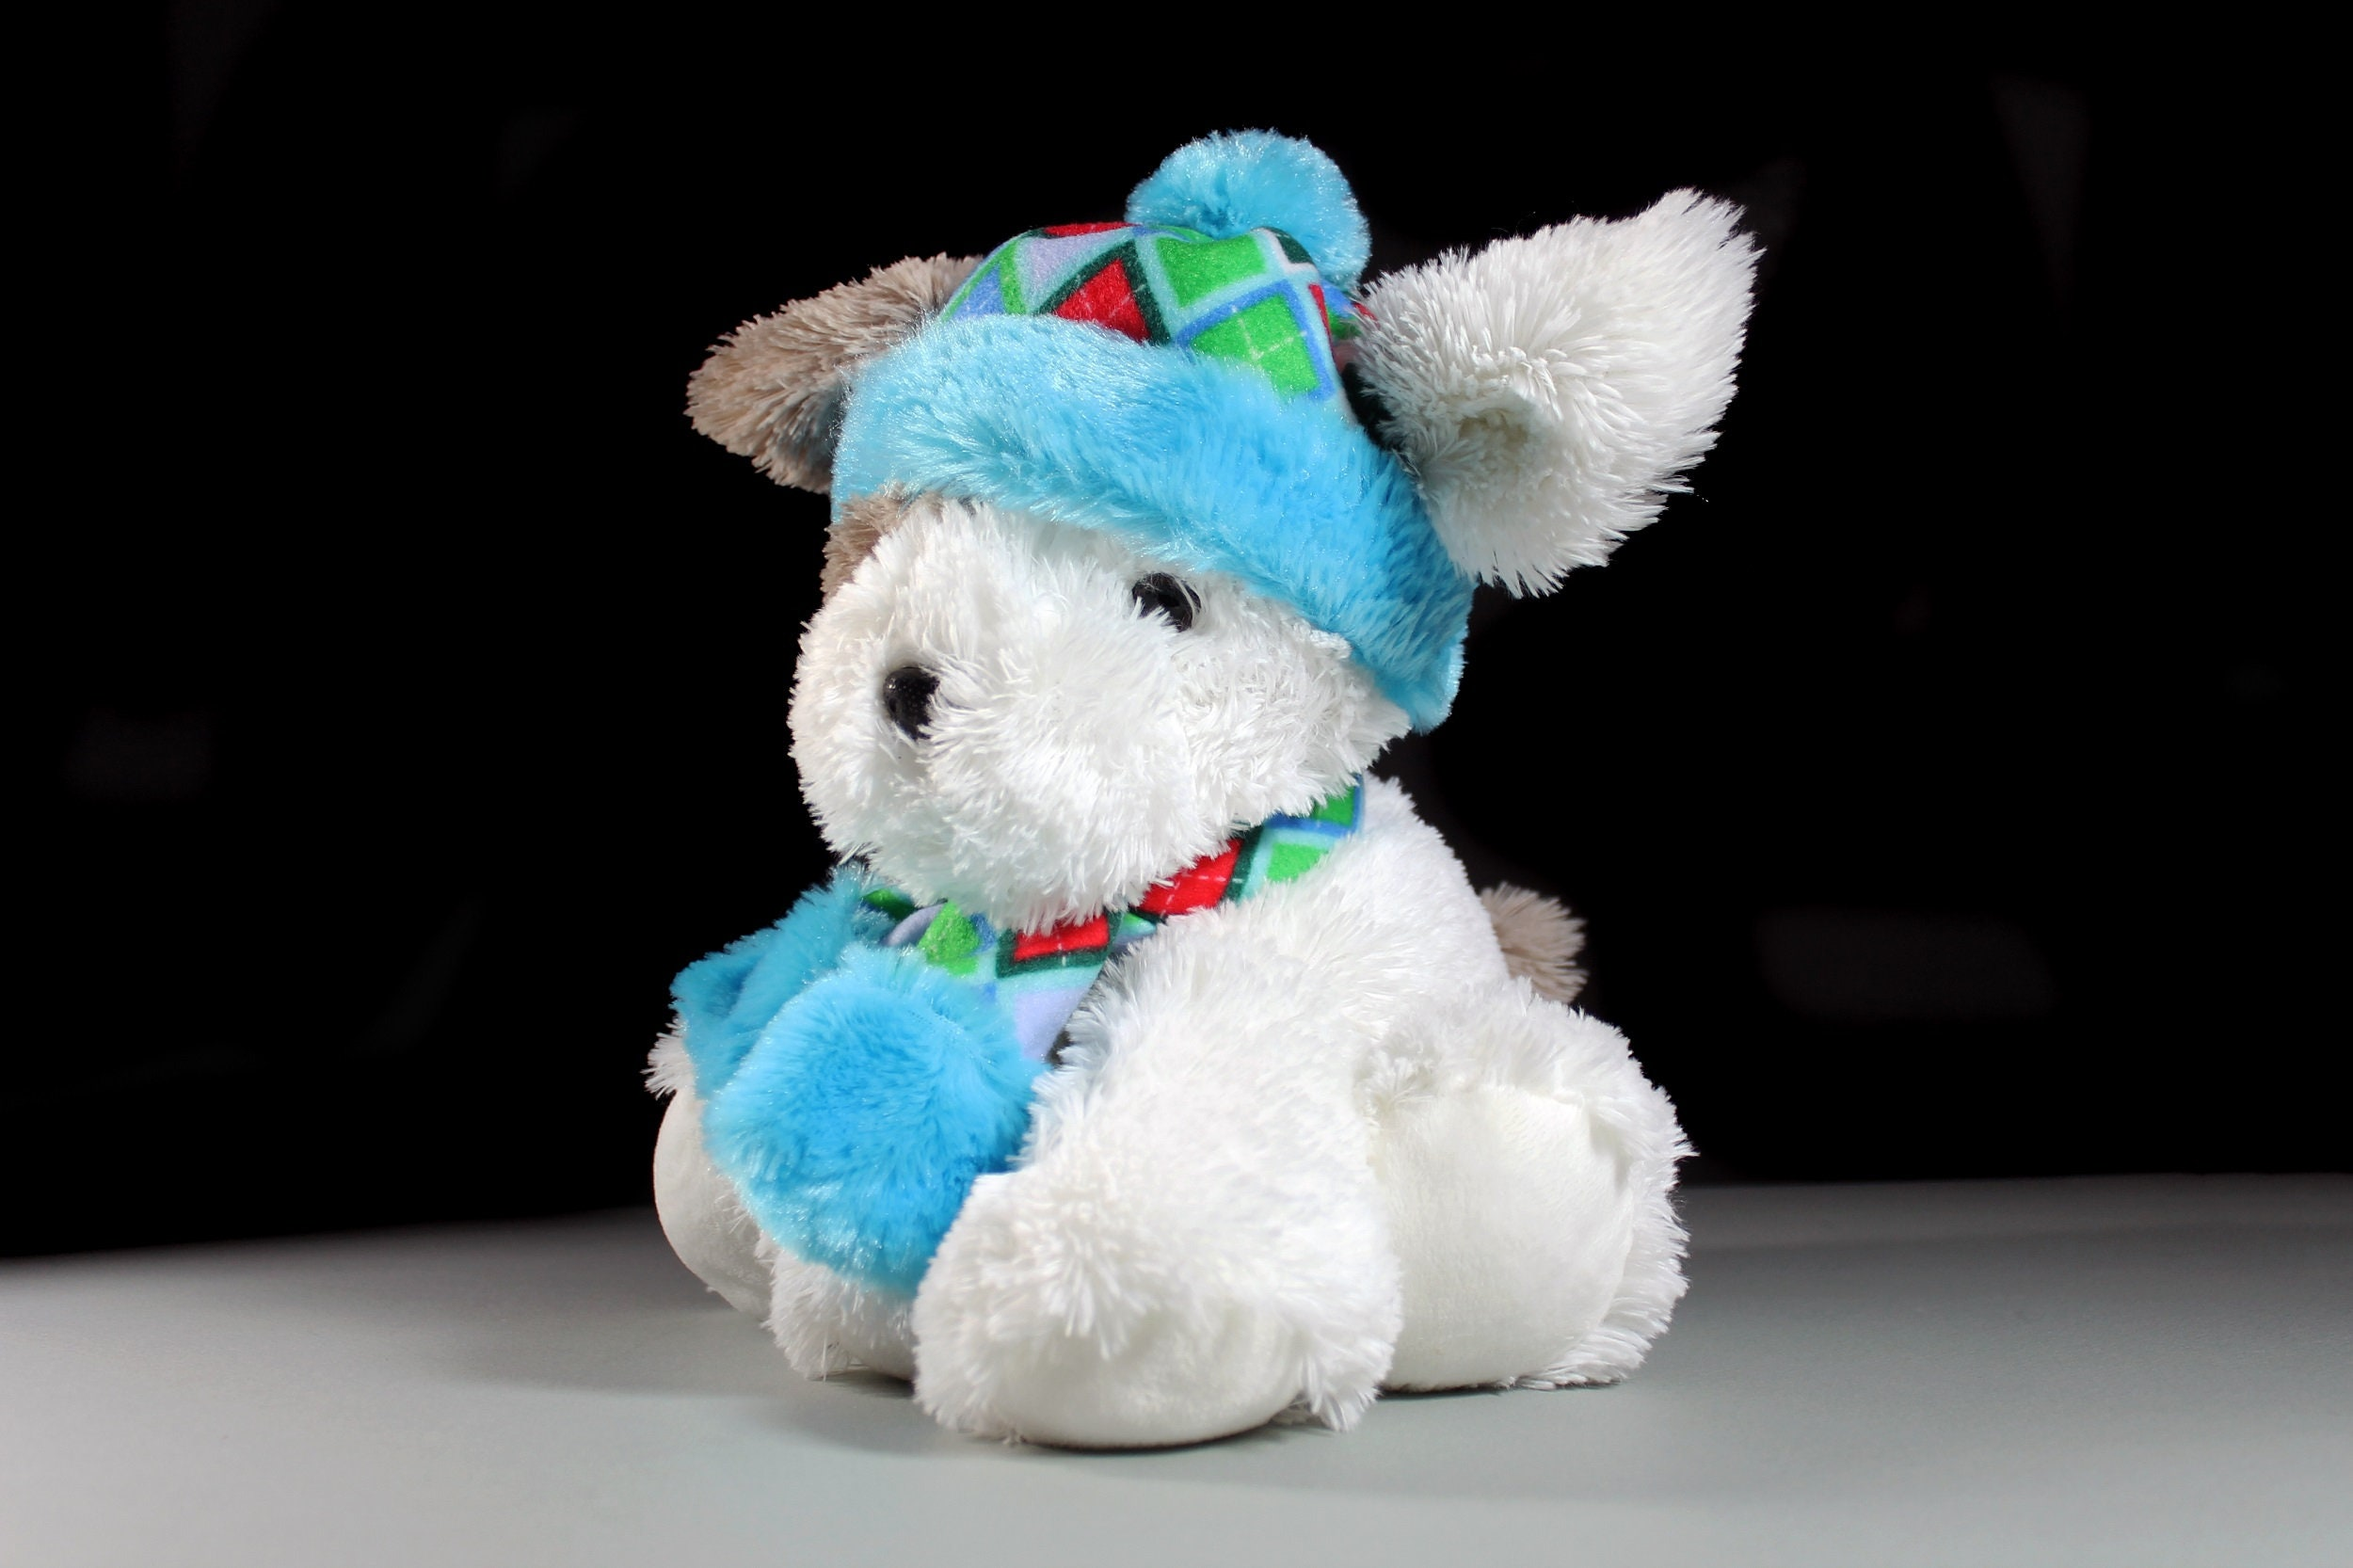 Blue Big Teddy Bear, Plush Dog Stuffed Animal Hugfun International White Child S Gift Idea Baby Shower Nursery Decor Dog With Hat And Scarf